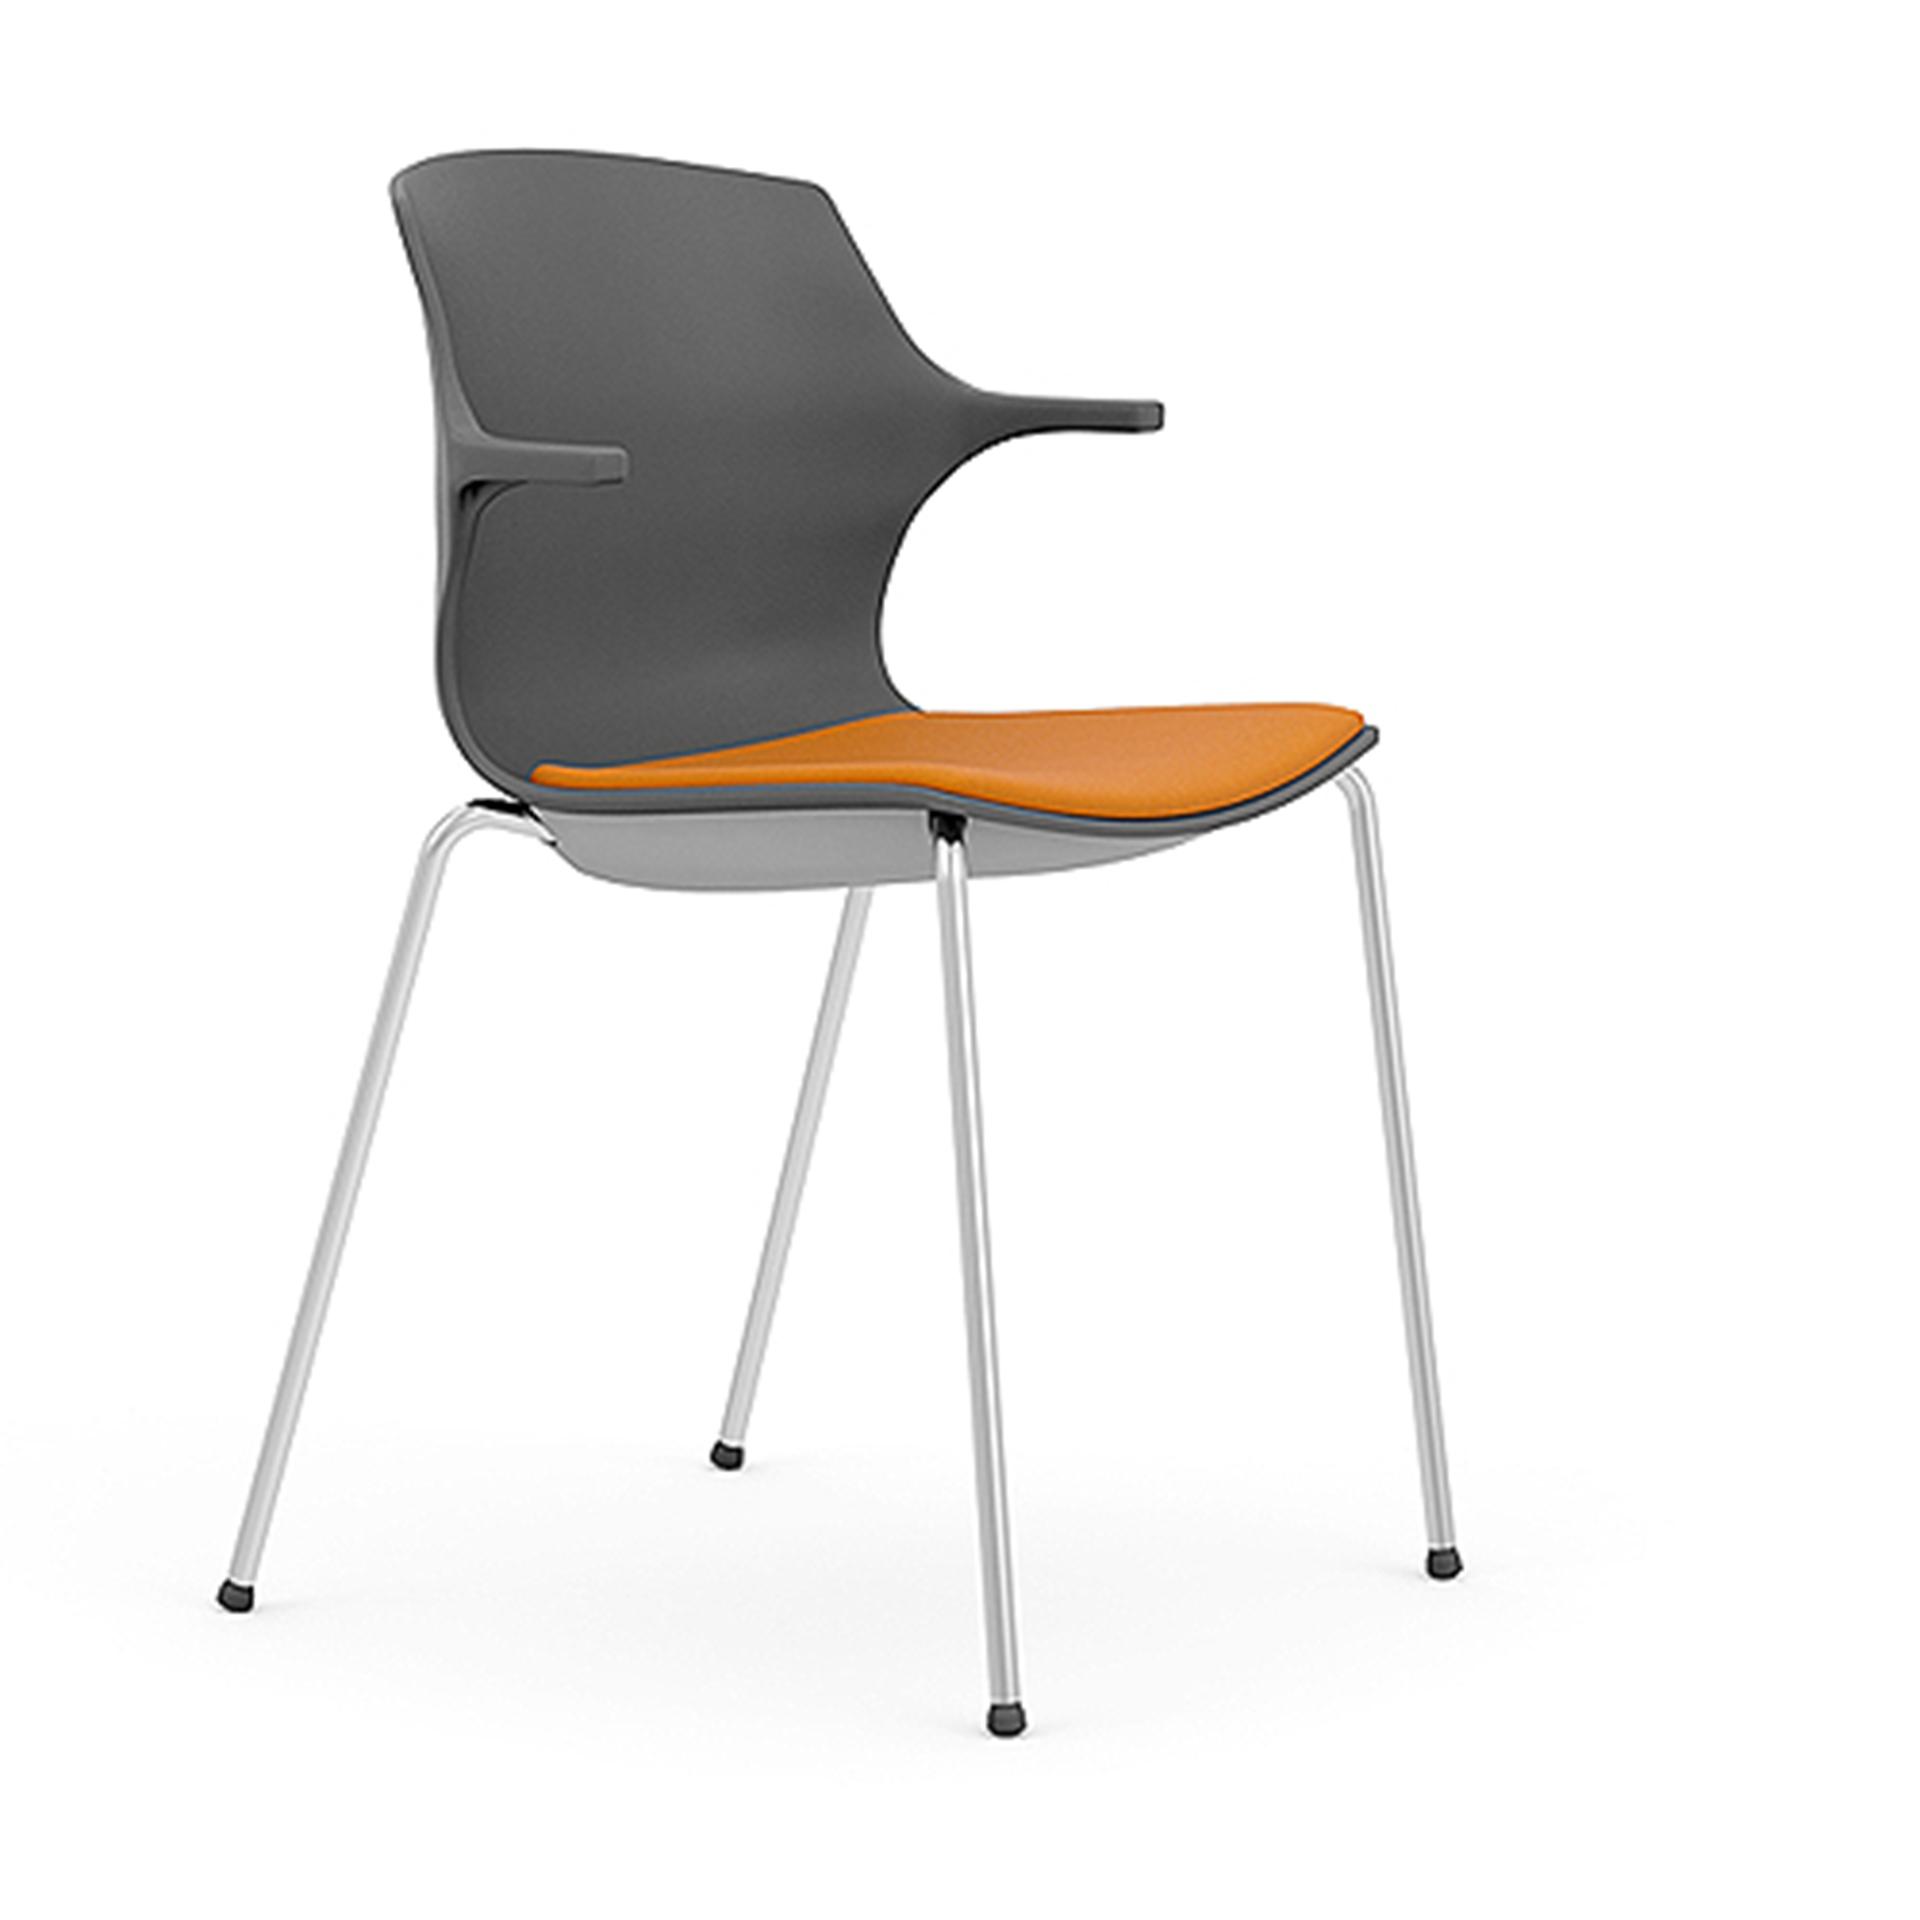 Four Legged Chair with arms